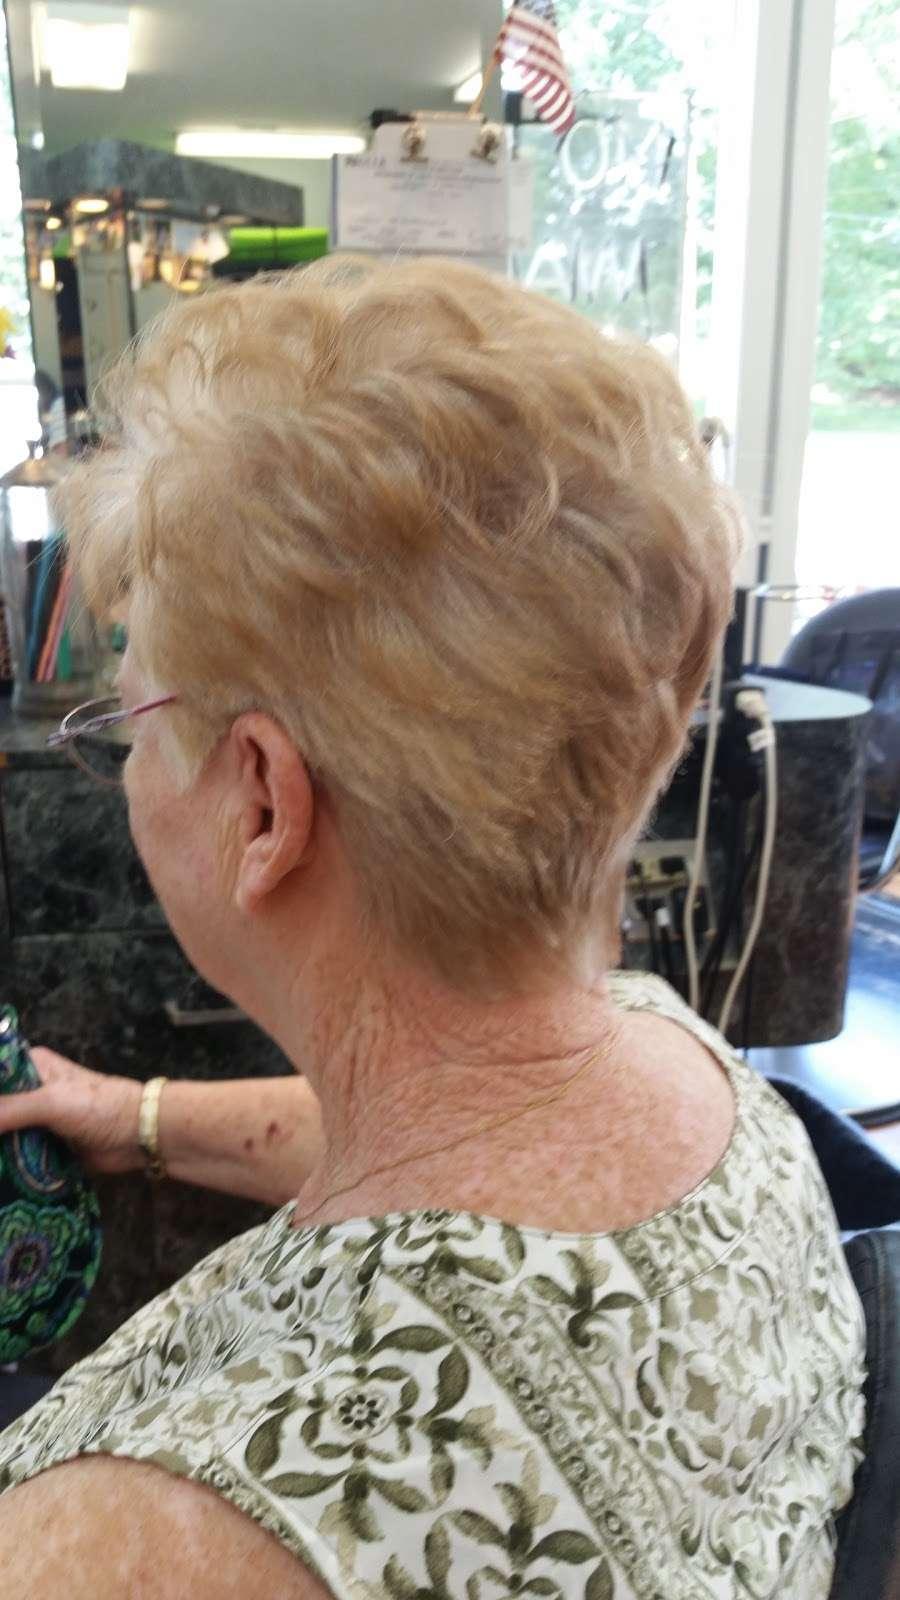 Island Dreams Hair Salon - hair care  | Photo 1 of 2 | Address: 11439 Eastern Ave, Baltimore, MD 21220, USA | Phone: (410) 335-2288